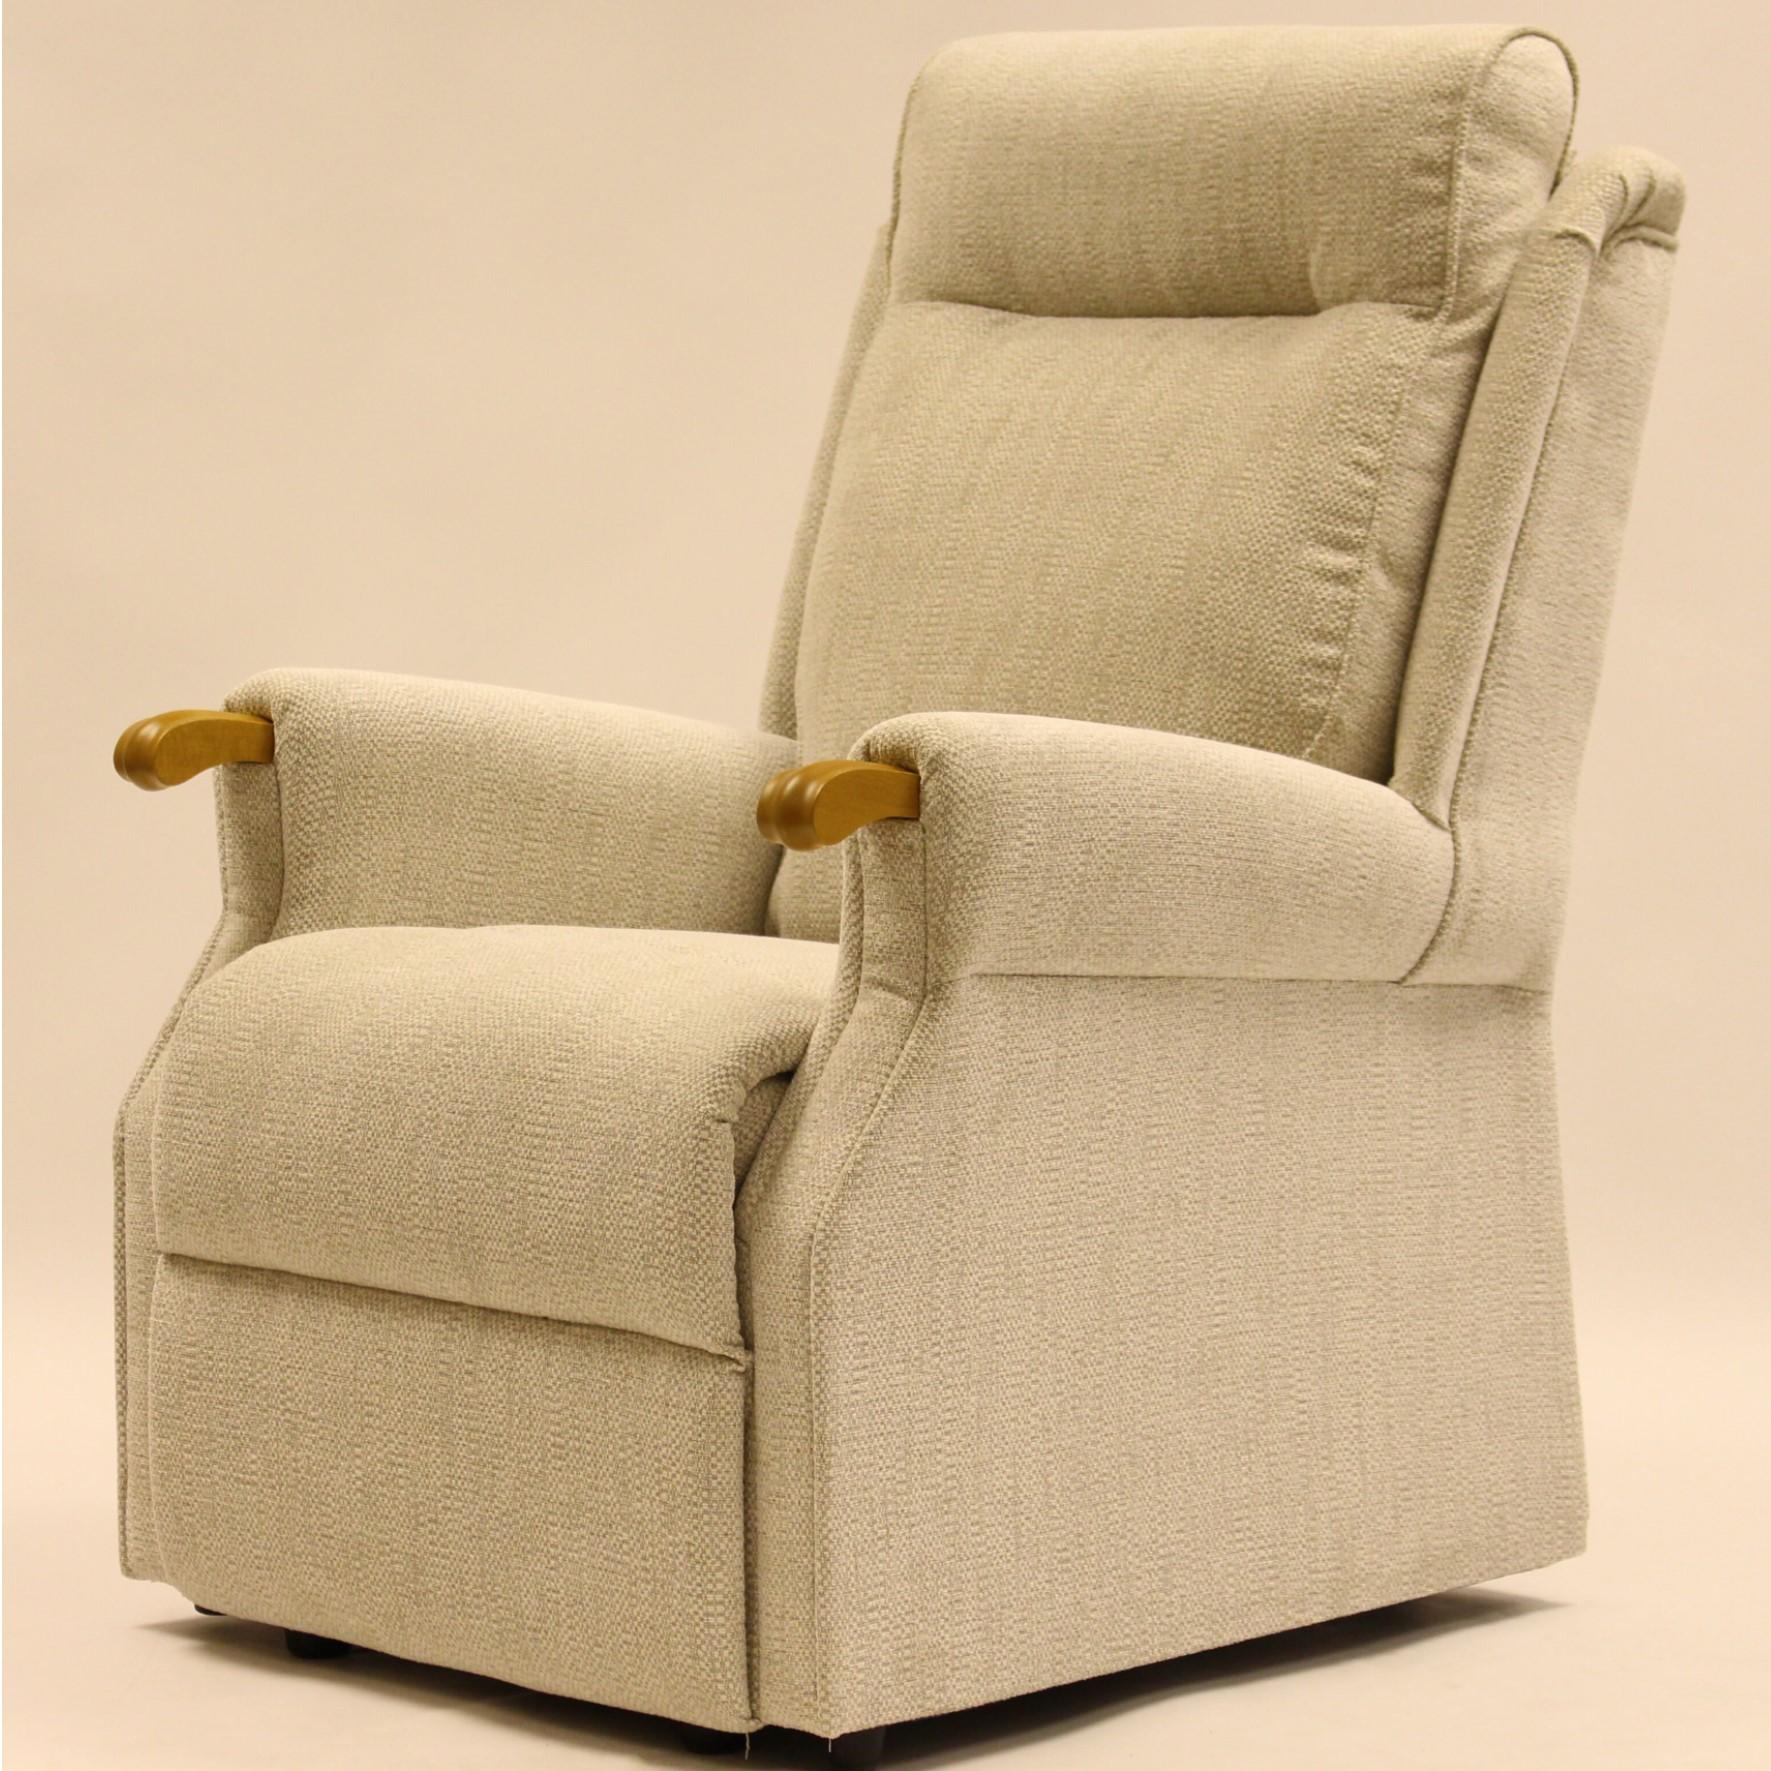 Morocco Upholstered Chai